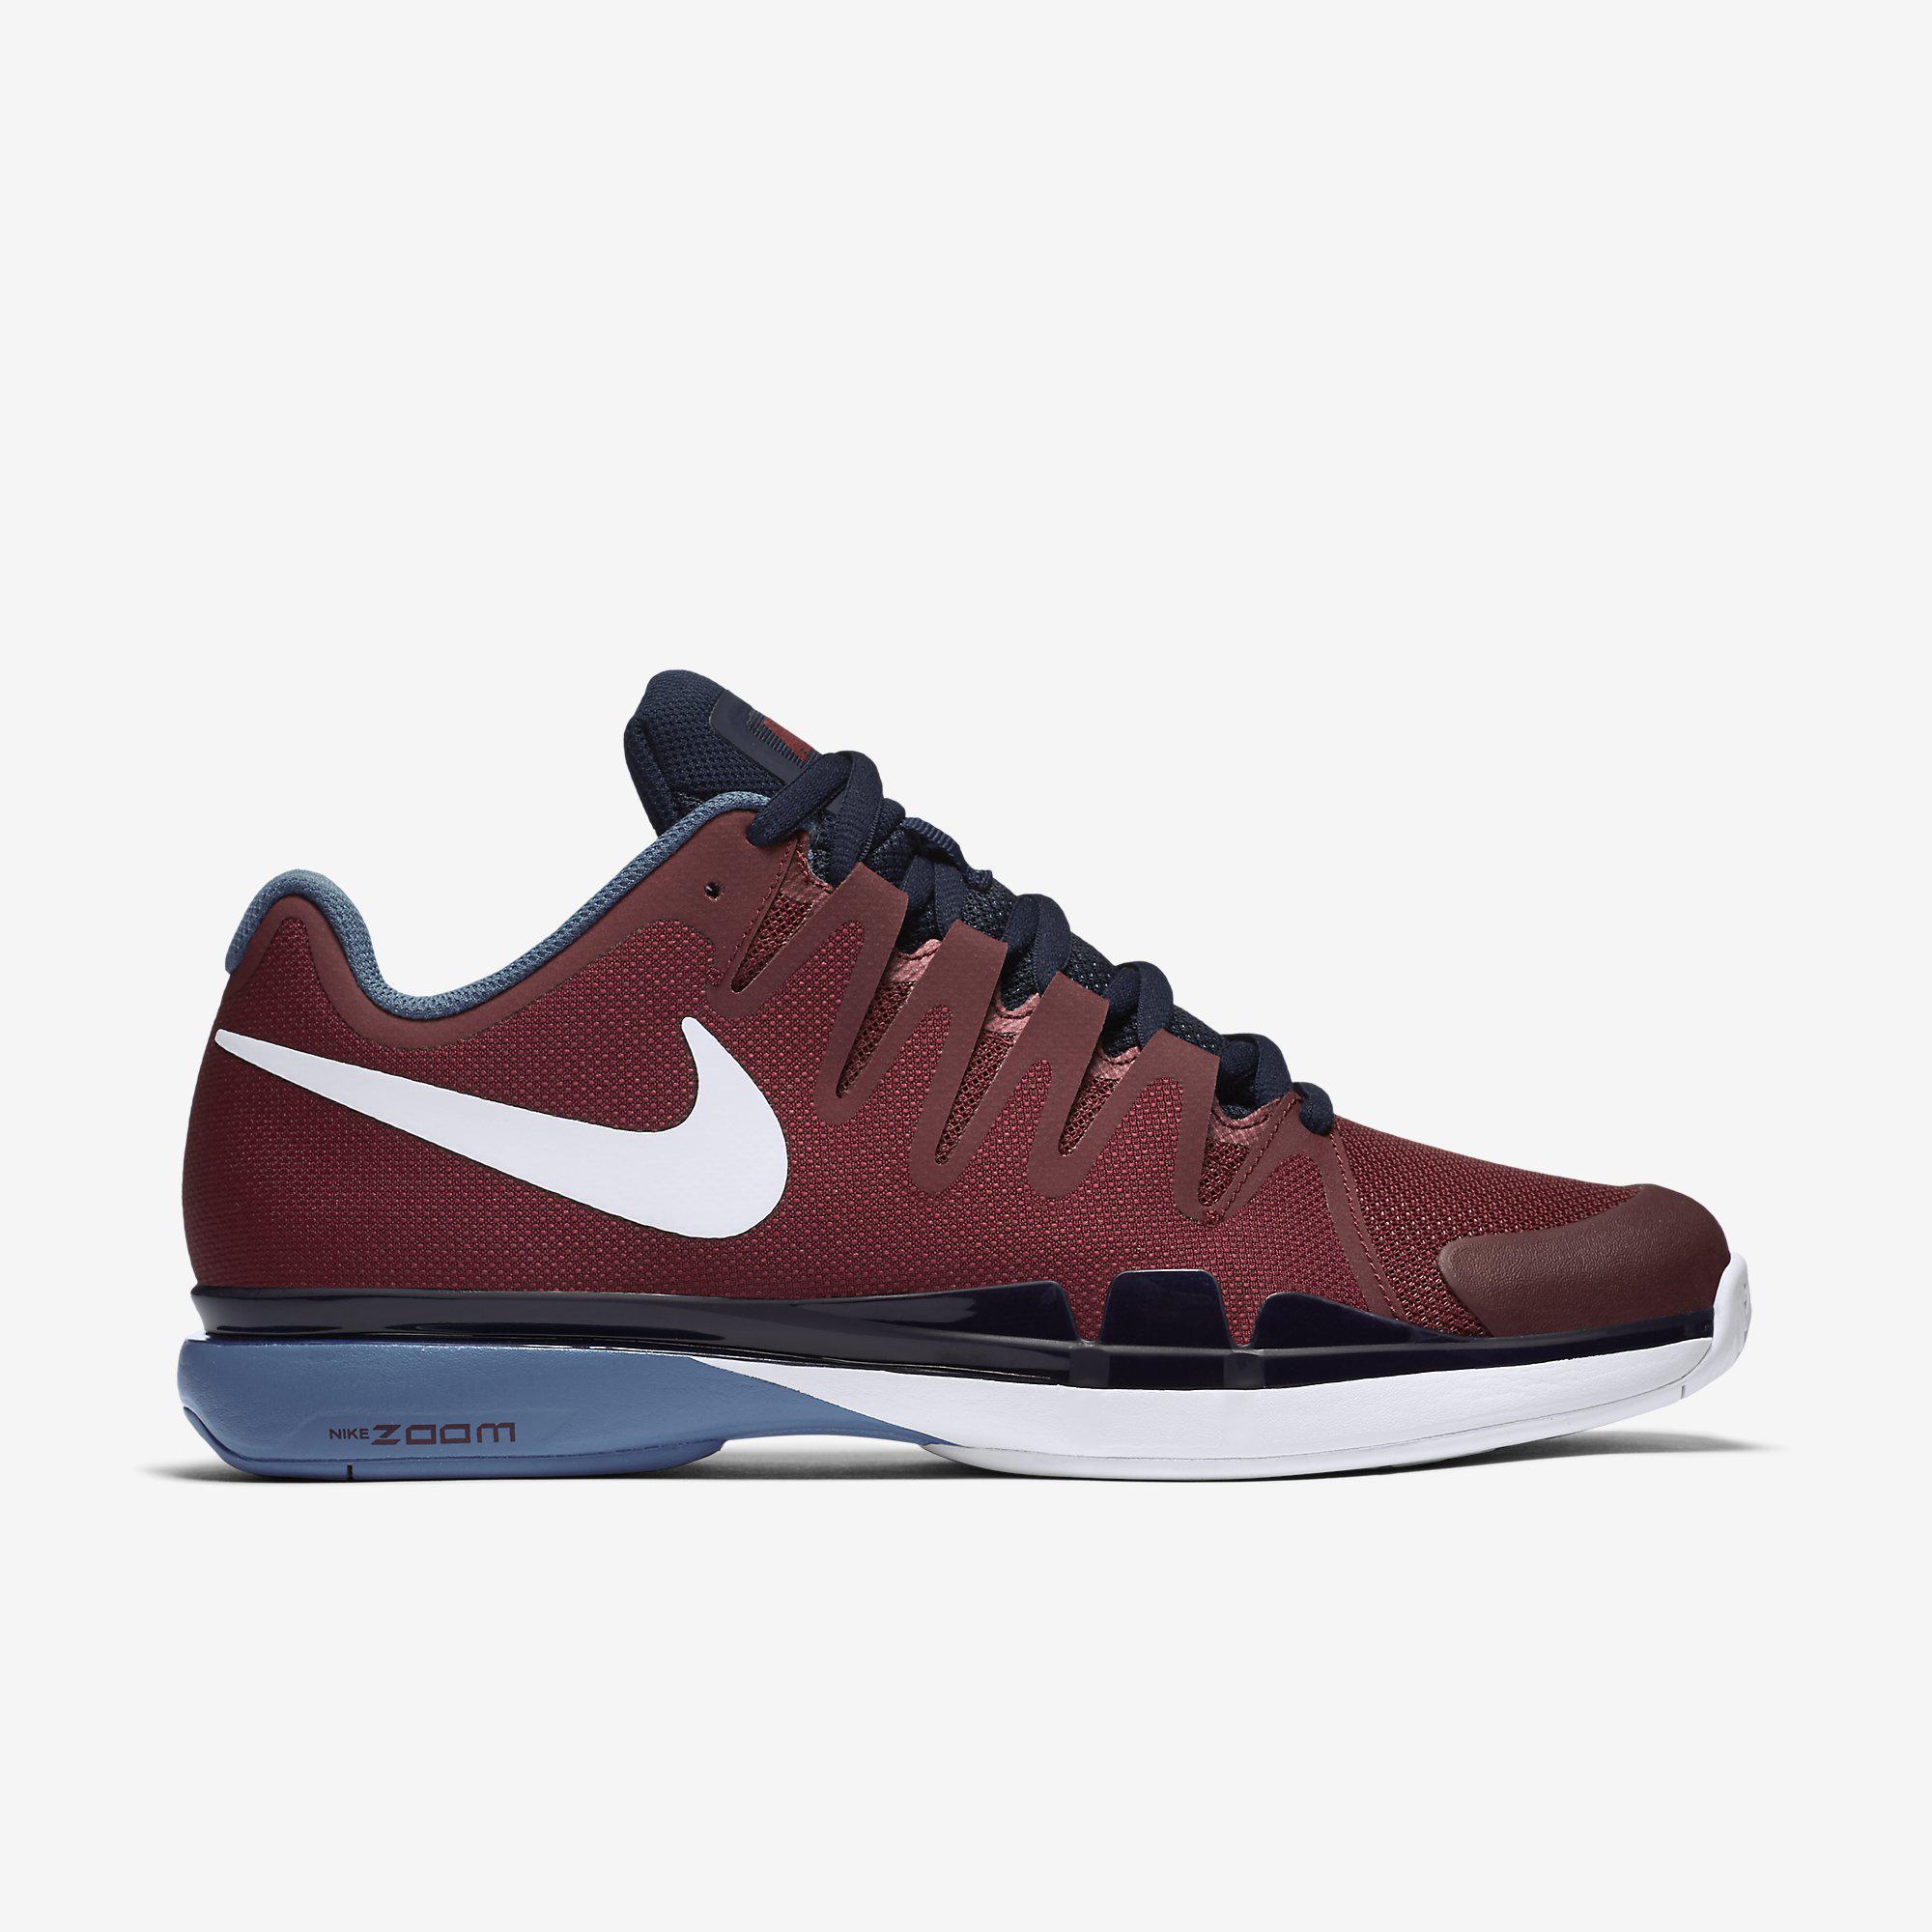 d9795fbbaea47 Nike Mens Zoom Vapor 9.5 Tour Tennis Shoes - Red - Tennisnuts.com